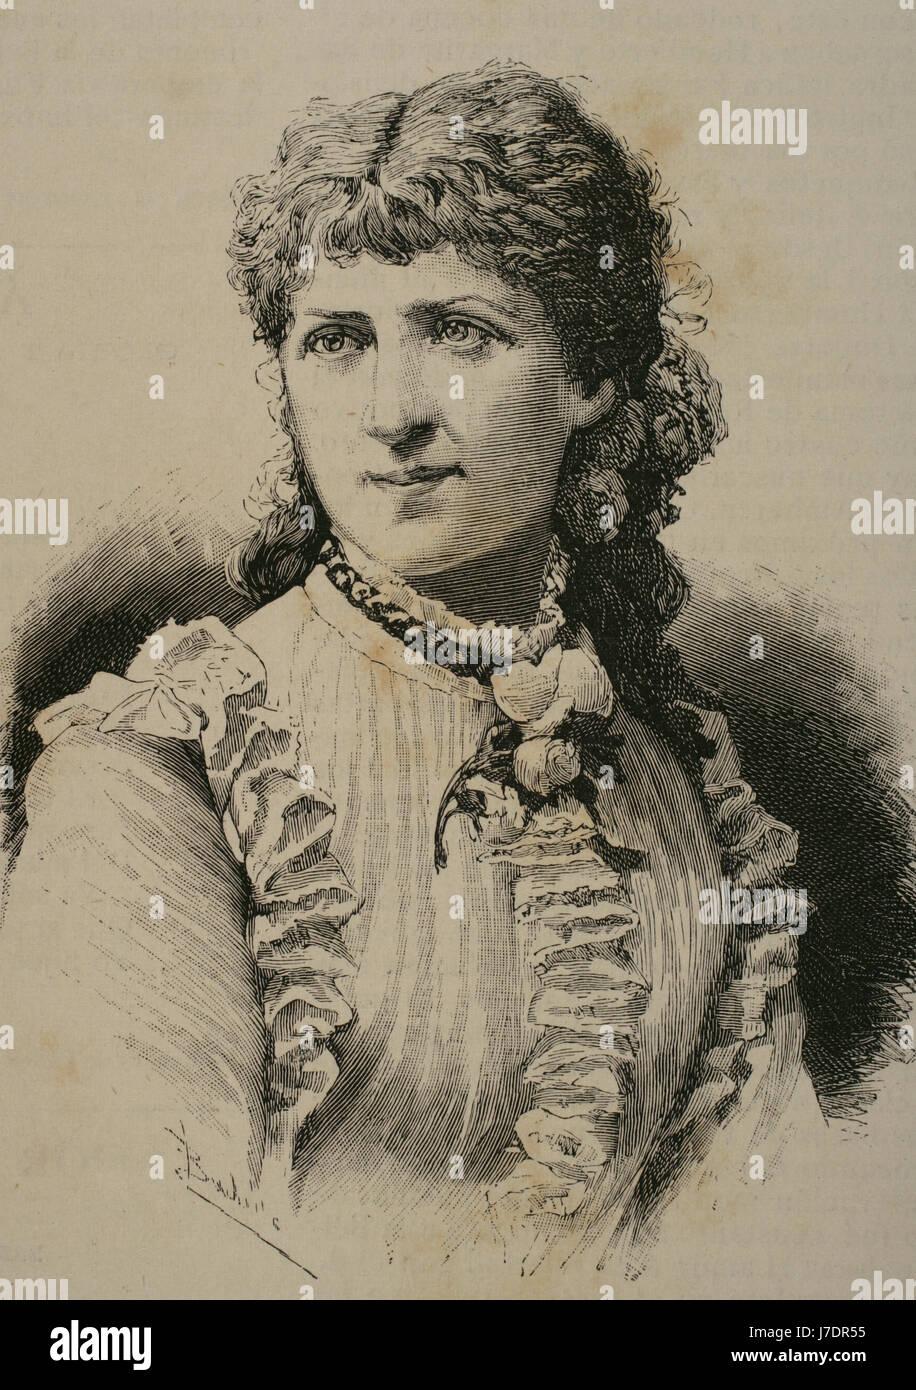 Louise Fastenrath (Goldmann) (1858-1914). German poetess, widow of the German writer Johannes Fastenrath (1858-1914). - Stock Image